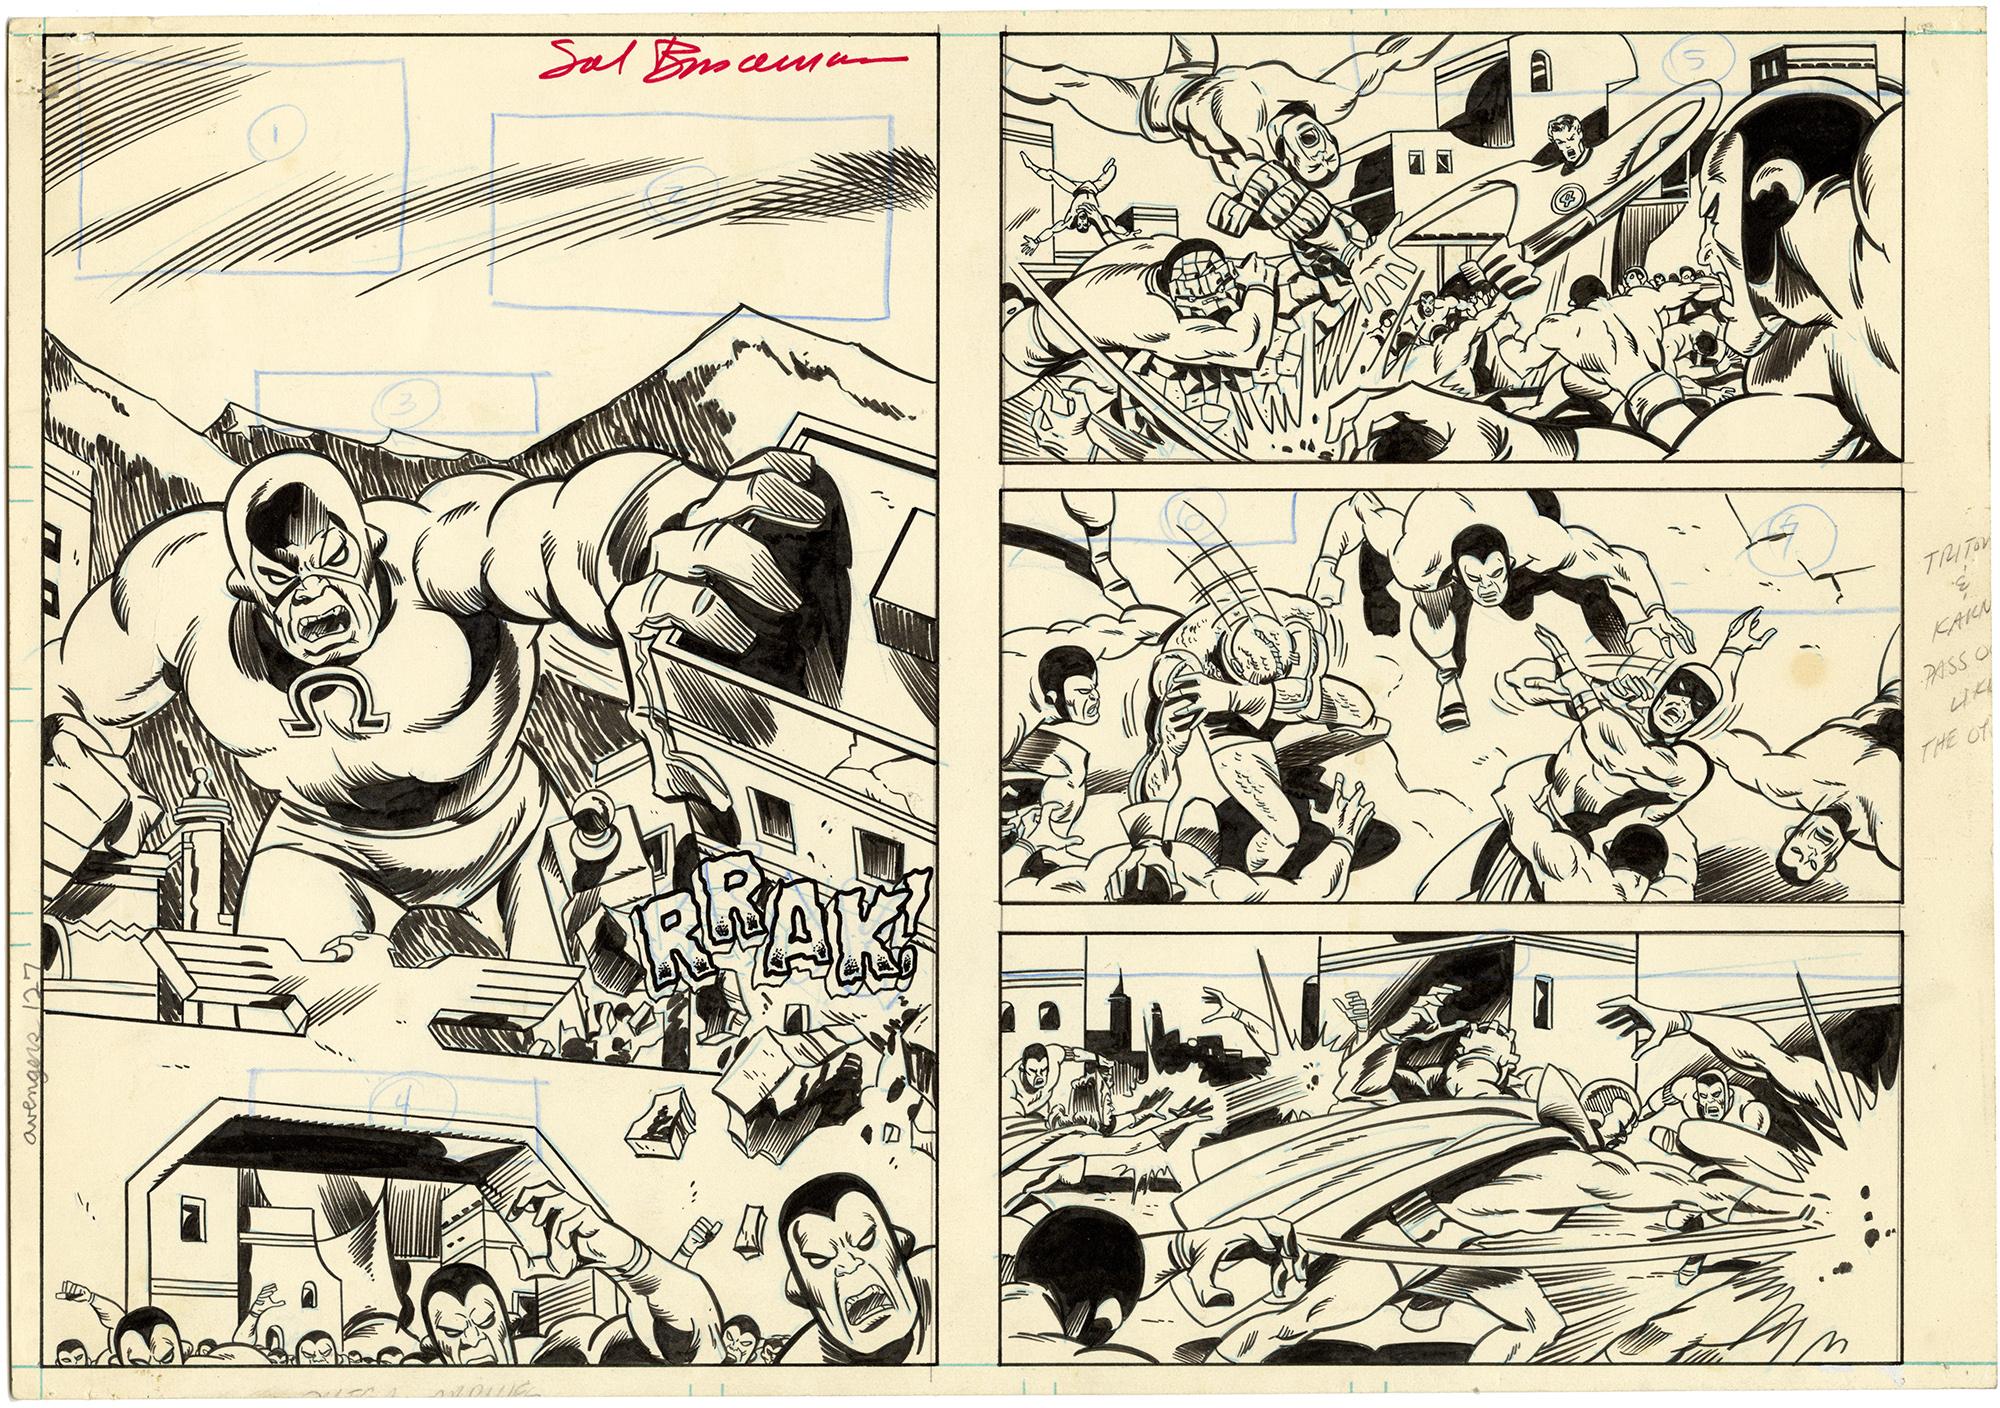 Avengers #127 p15-16 (Signed)